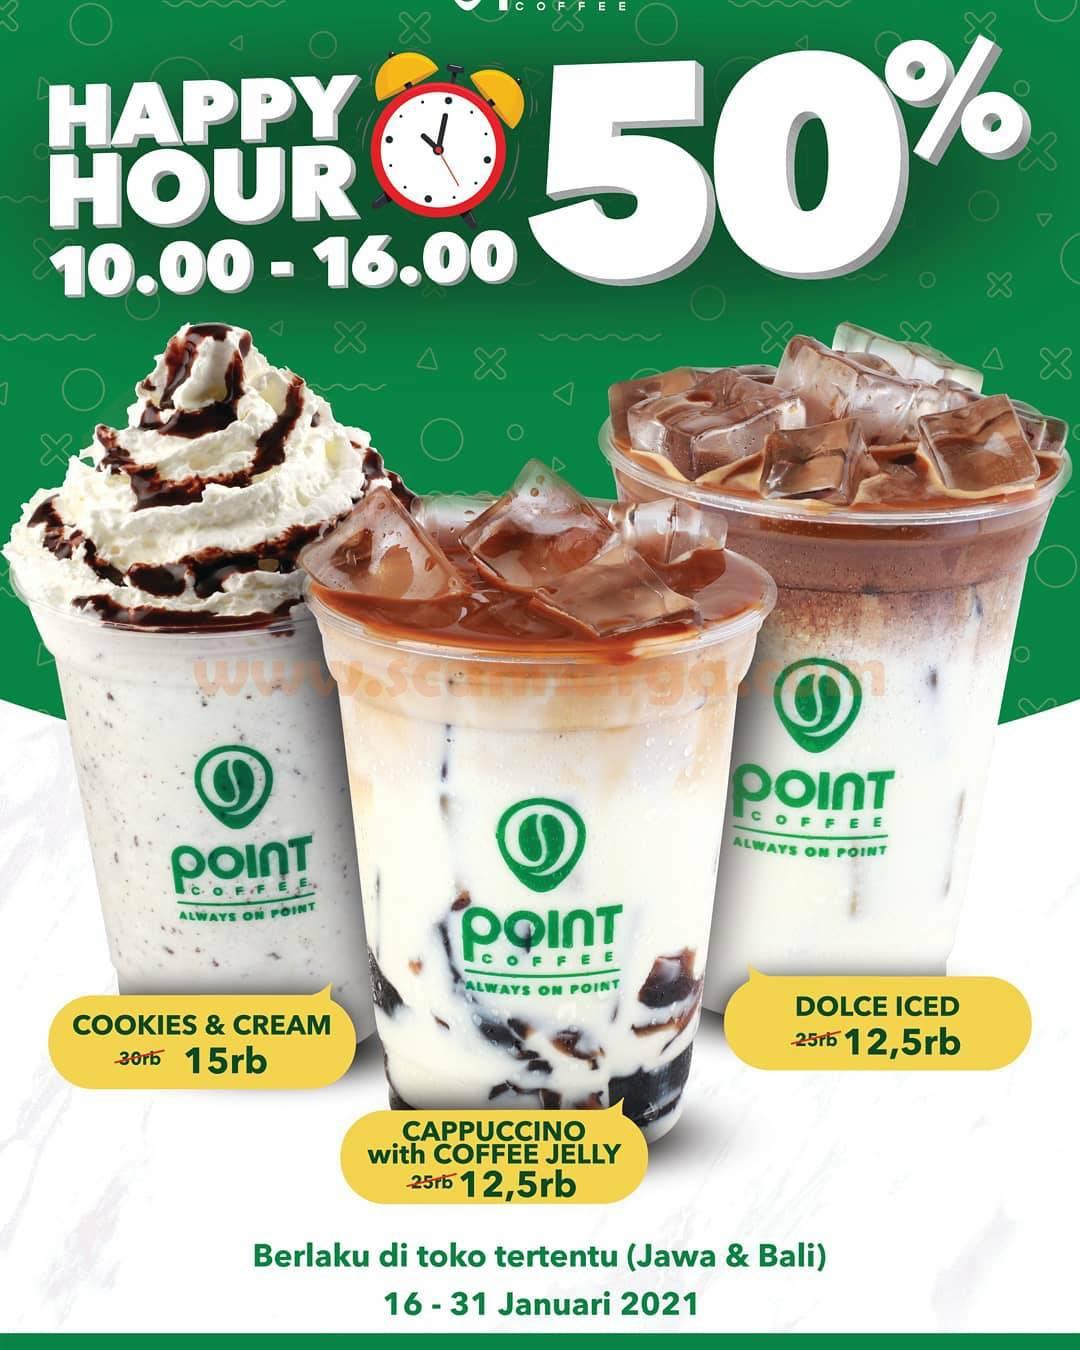 POINT COFEE Promo HAPPY HOUR Diskon hingga 50%